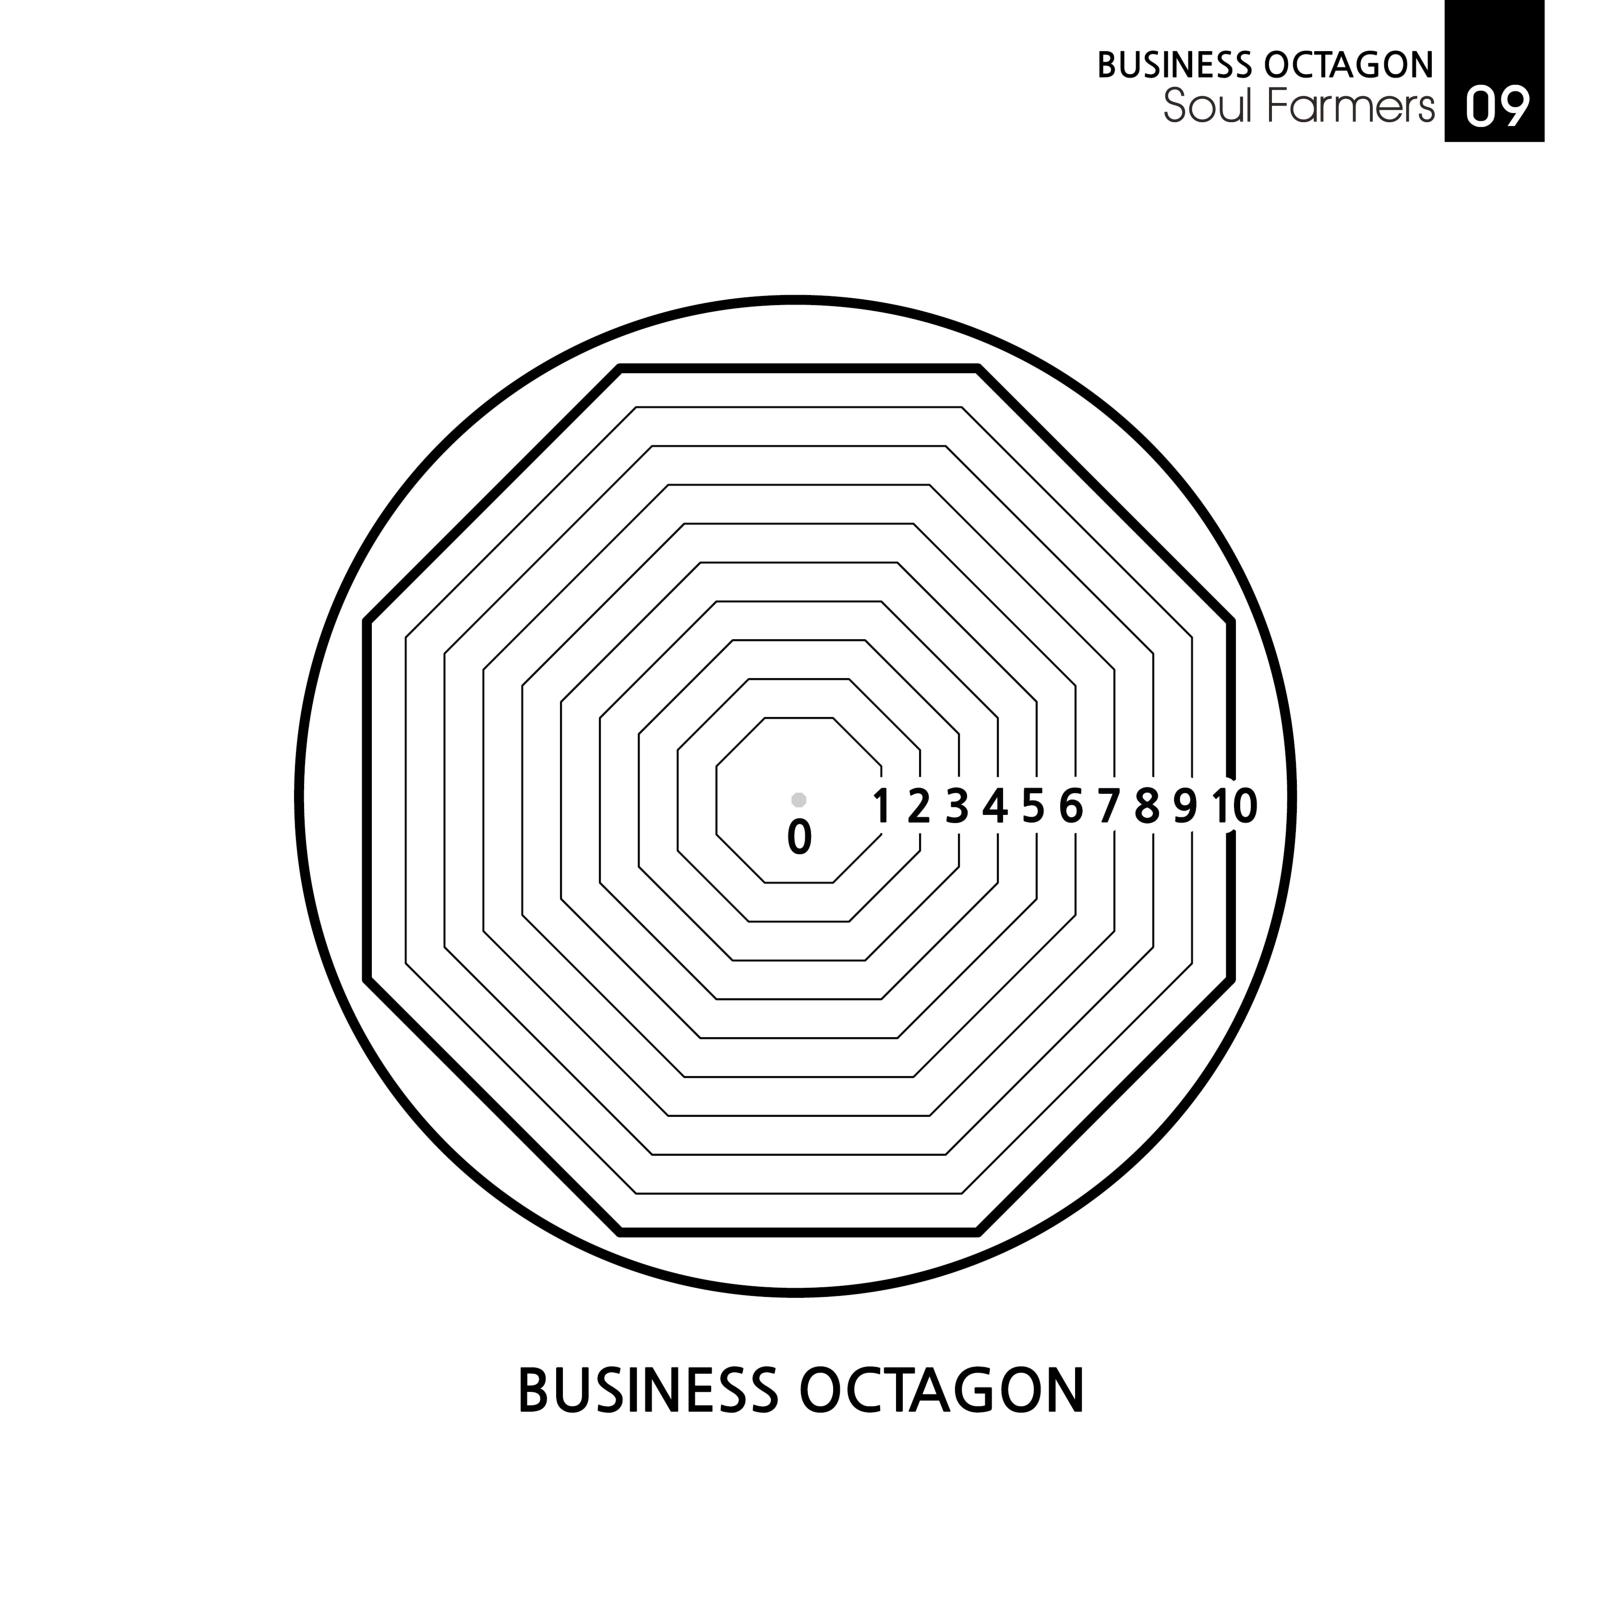 1600x1600 Biz. Dev.] Businessproject Octagon Soul